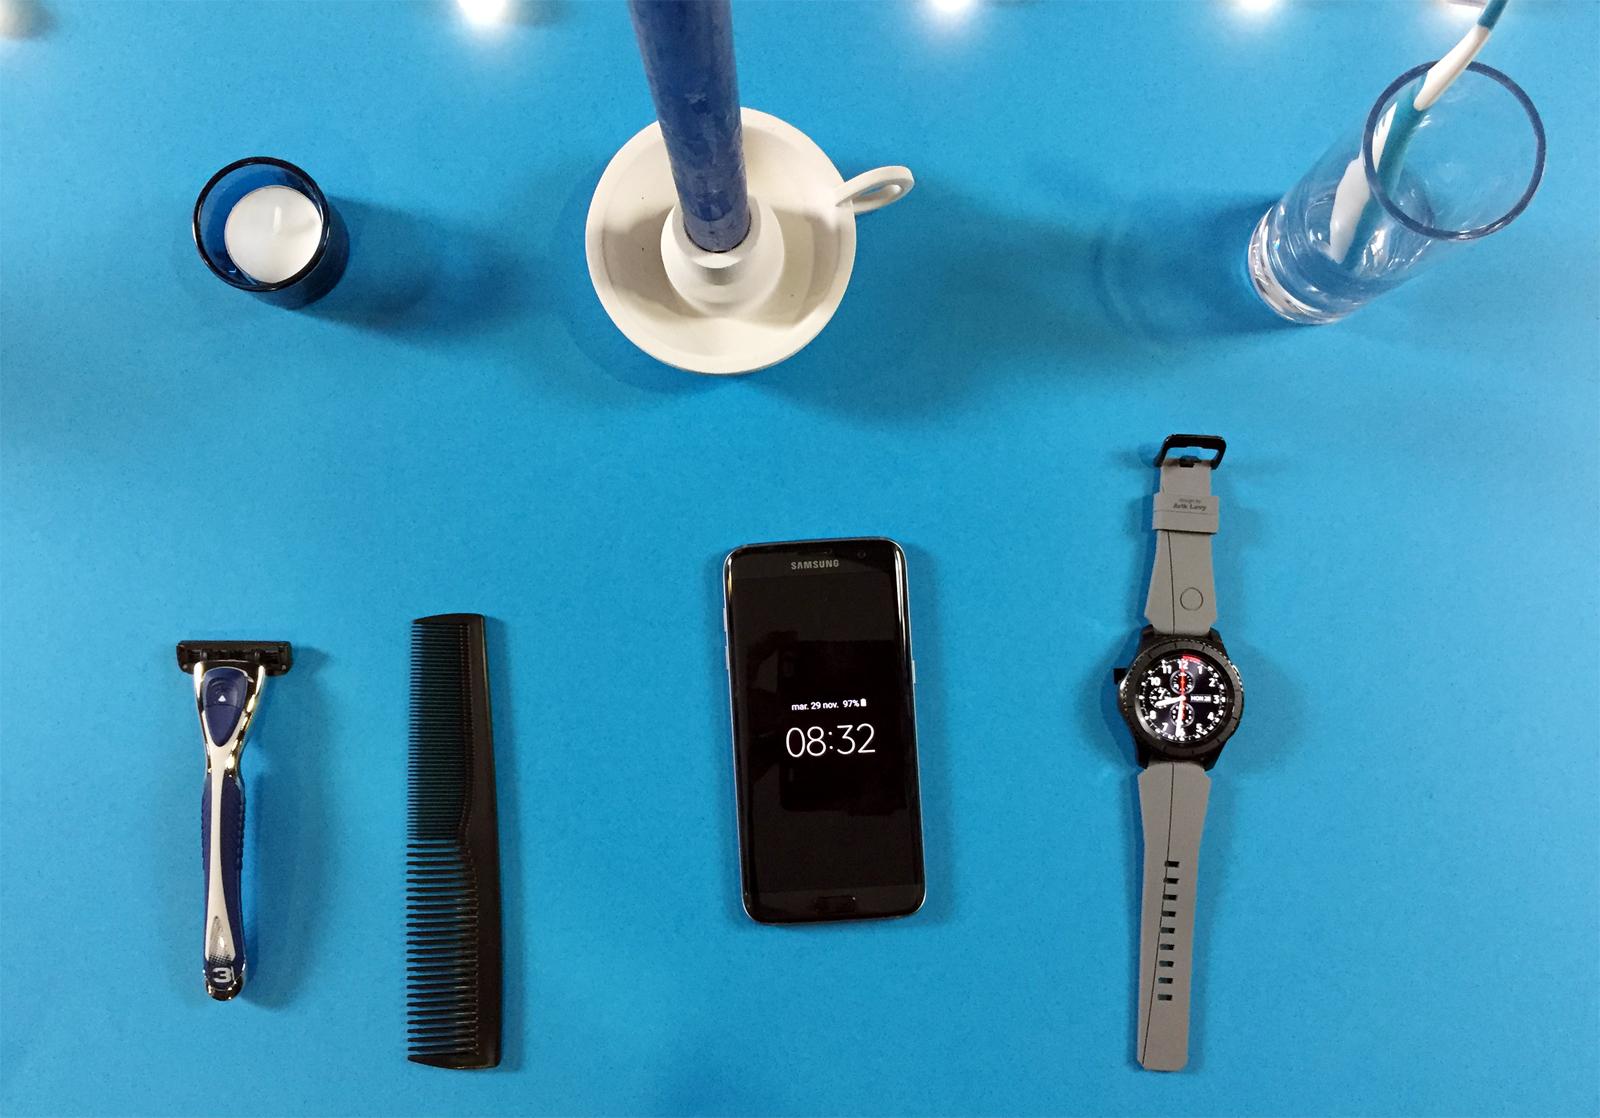 samsung-gear-s3-test-avis-montre-connectee-photo-by-blog-united-states-of-paris